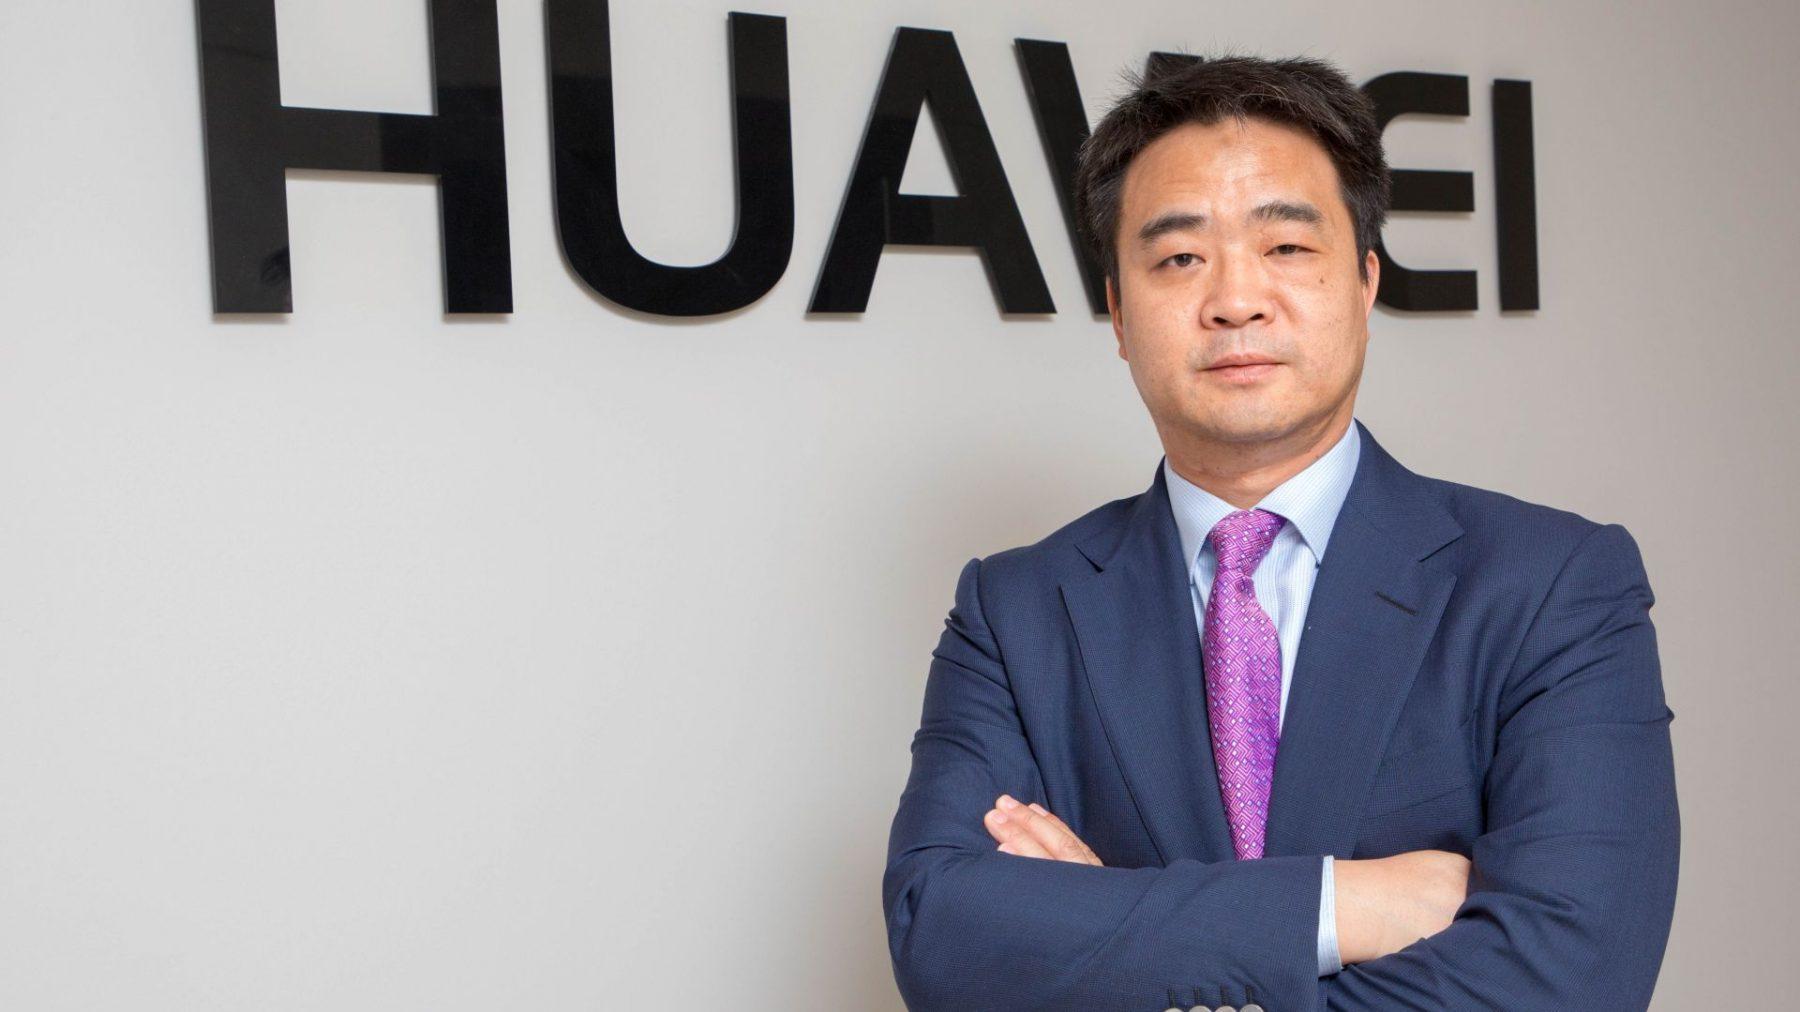 Eric Li Huawei